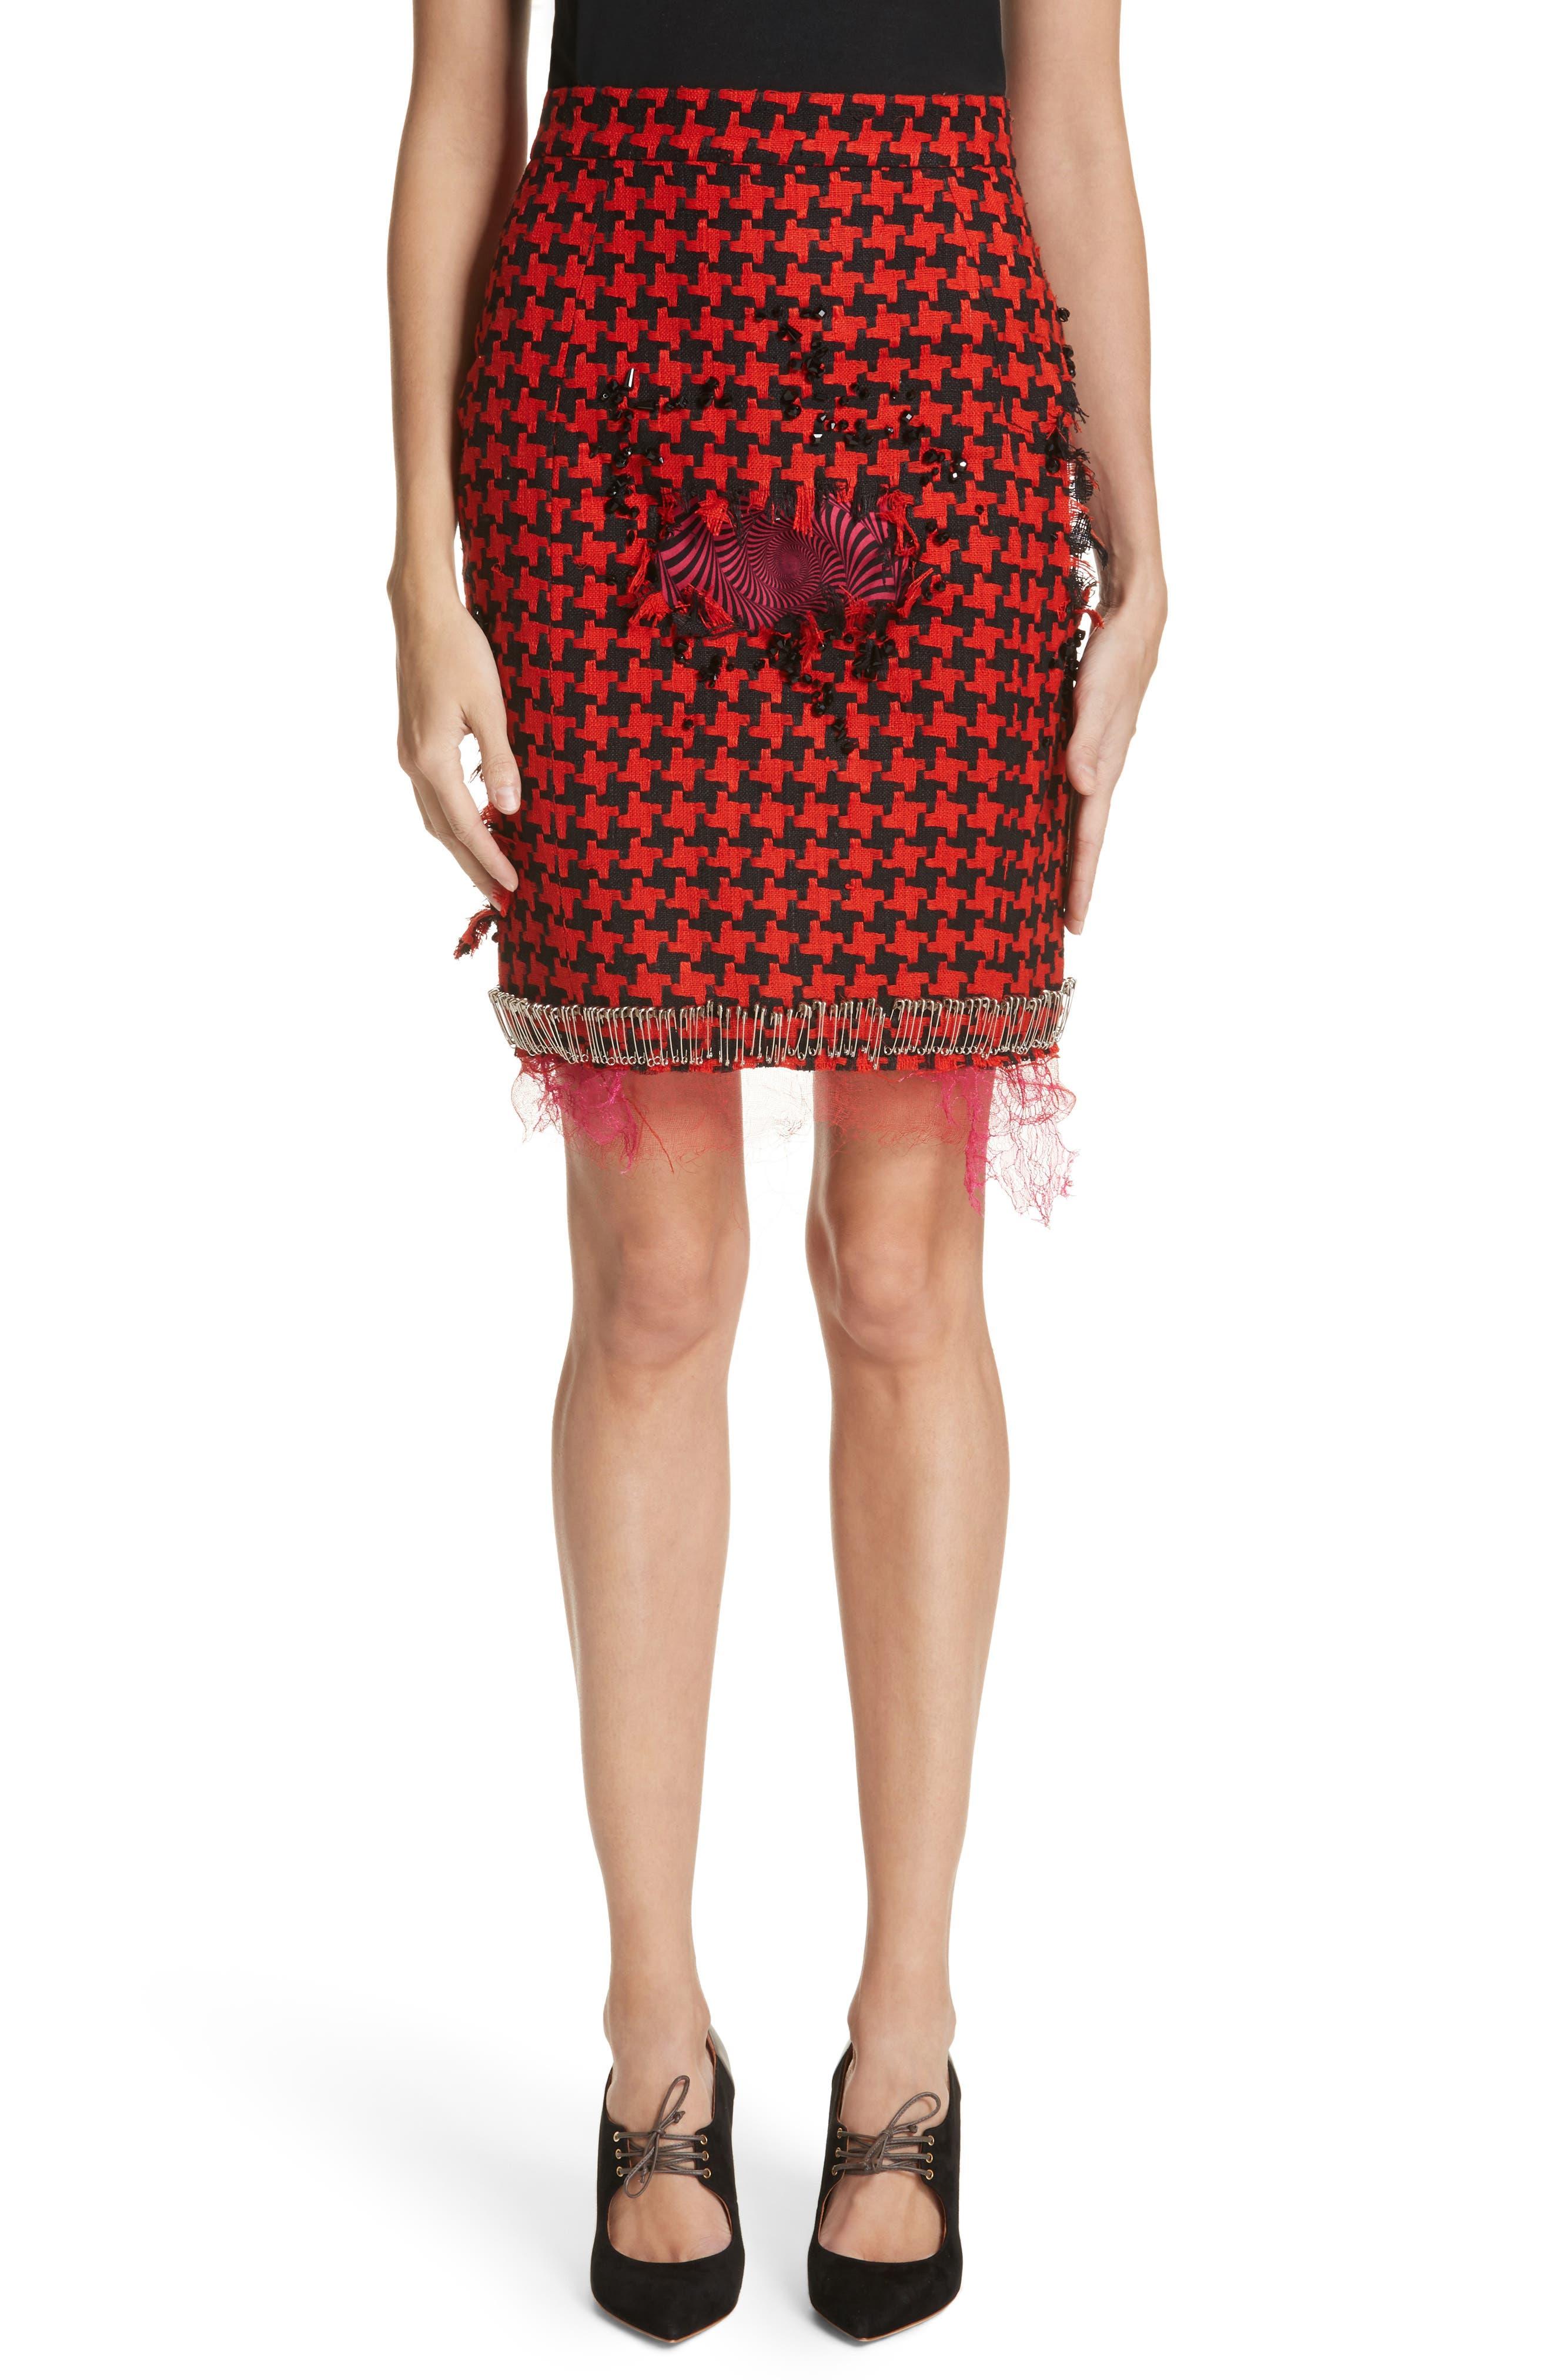 Dilara Findikoglu Prime Minister Houndstooth Wool Skirt